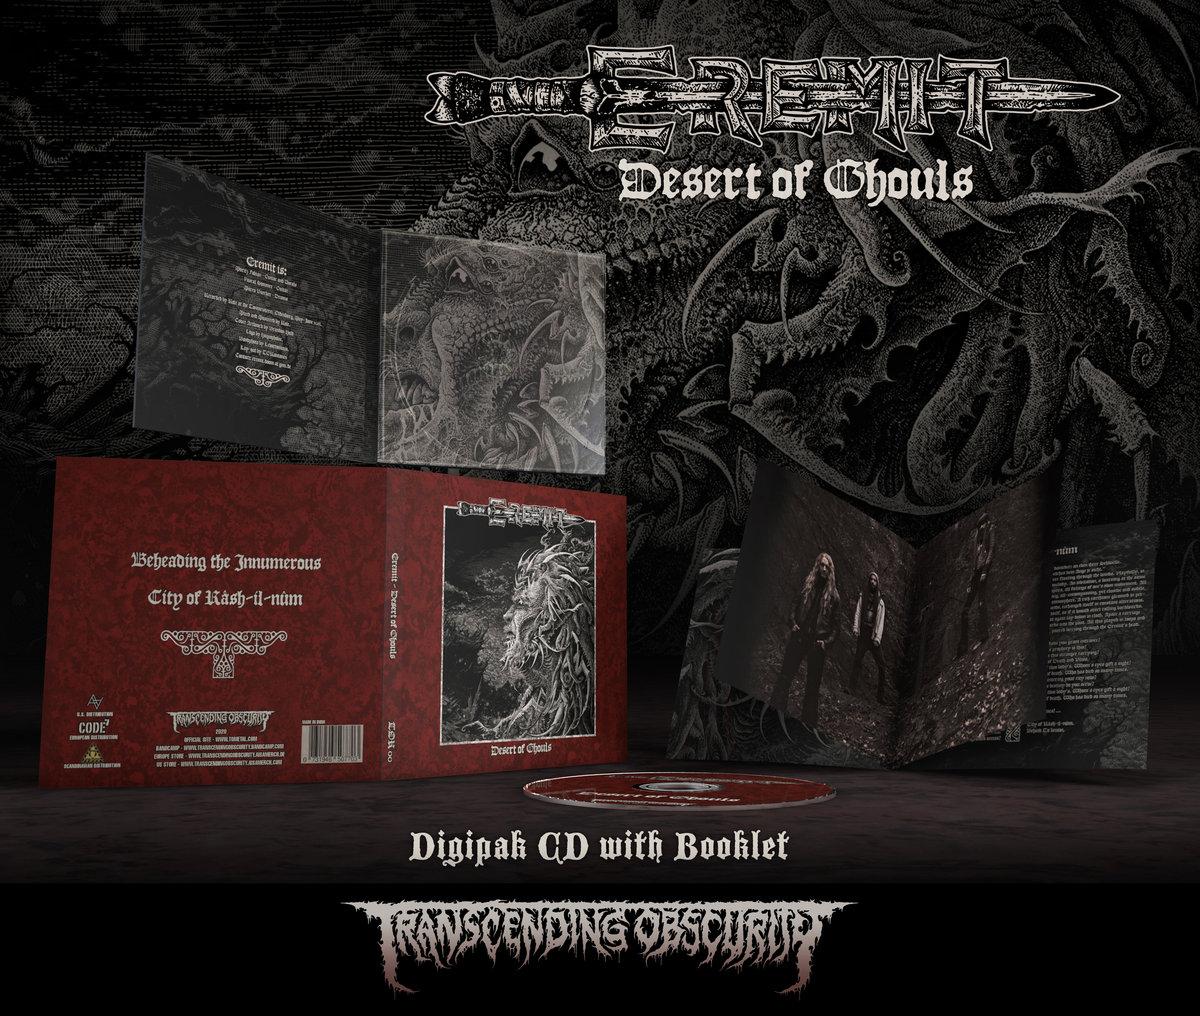 EREMIT - Desert of Ghouls Digipak CD with embossing/UV lamination + Booklet